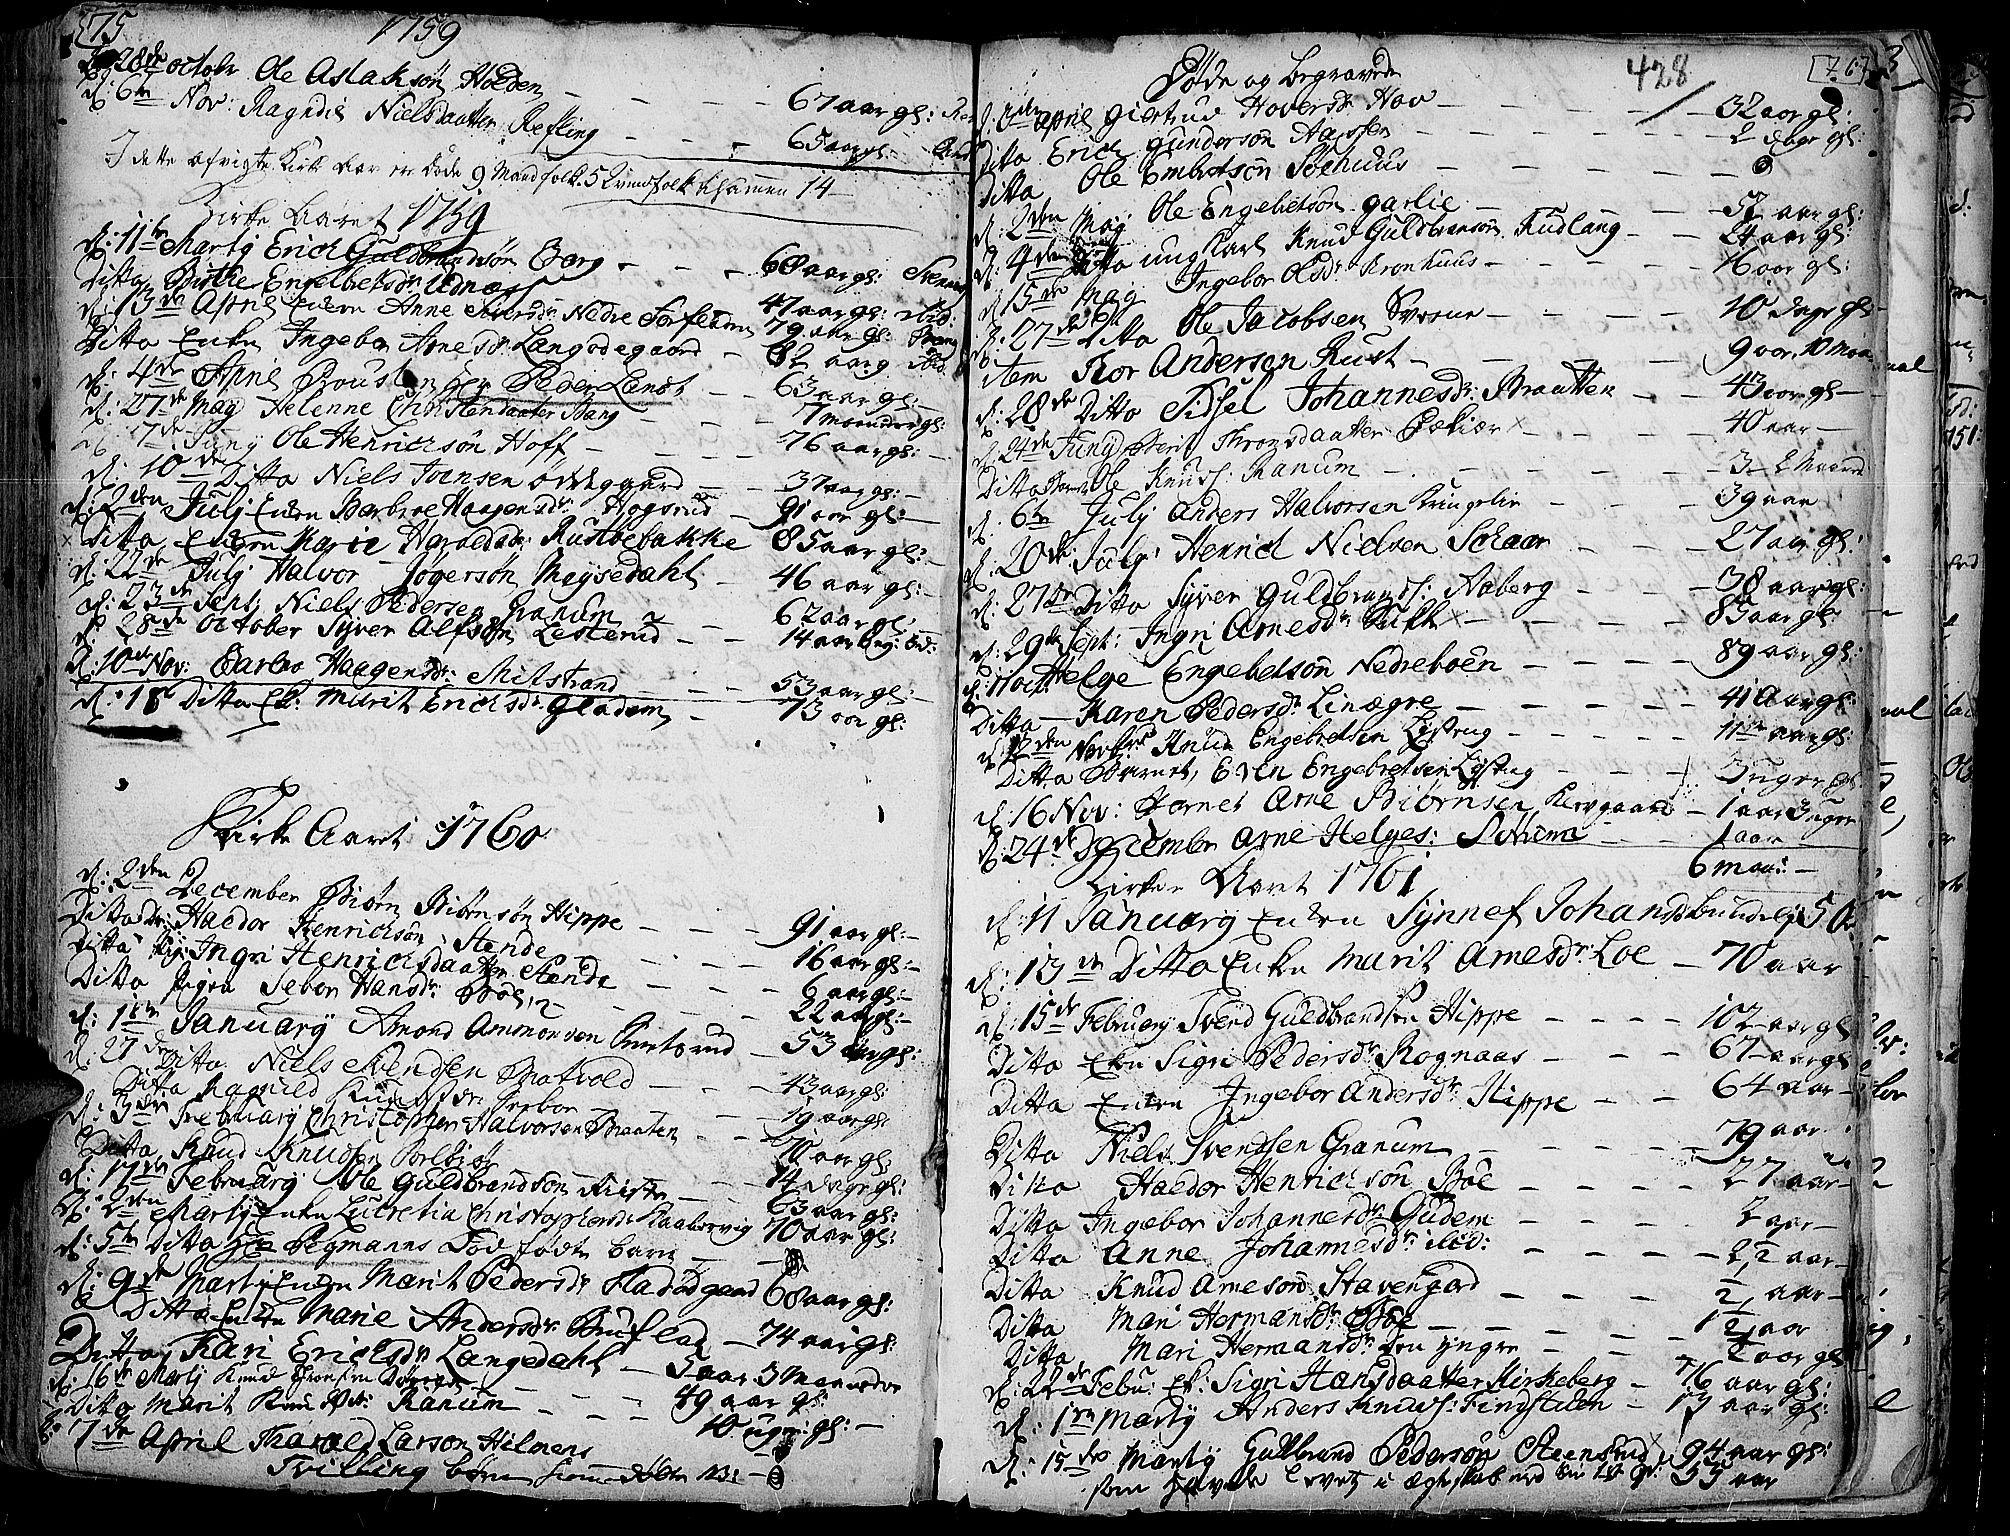 SAH, Aurdal prestekontor, Ministerialbok nr. 4, 1730-1762, s. 75-76